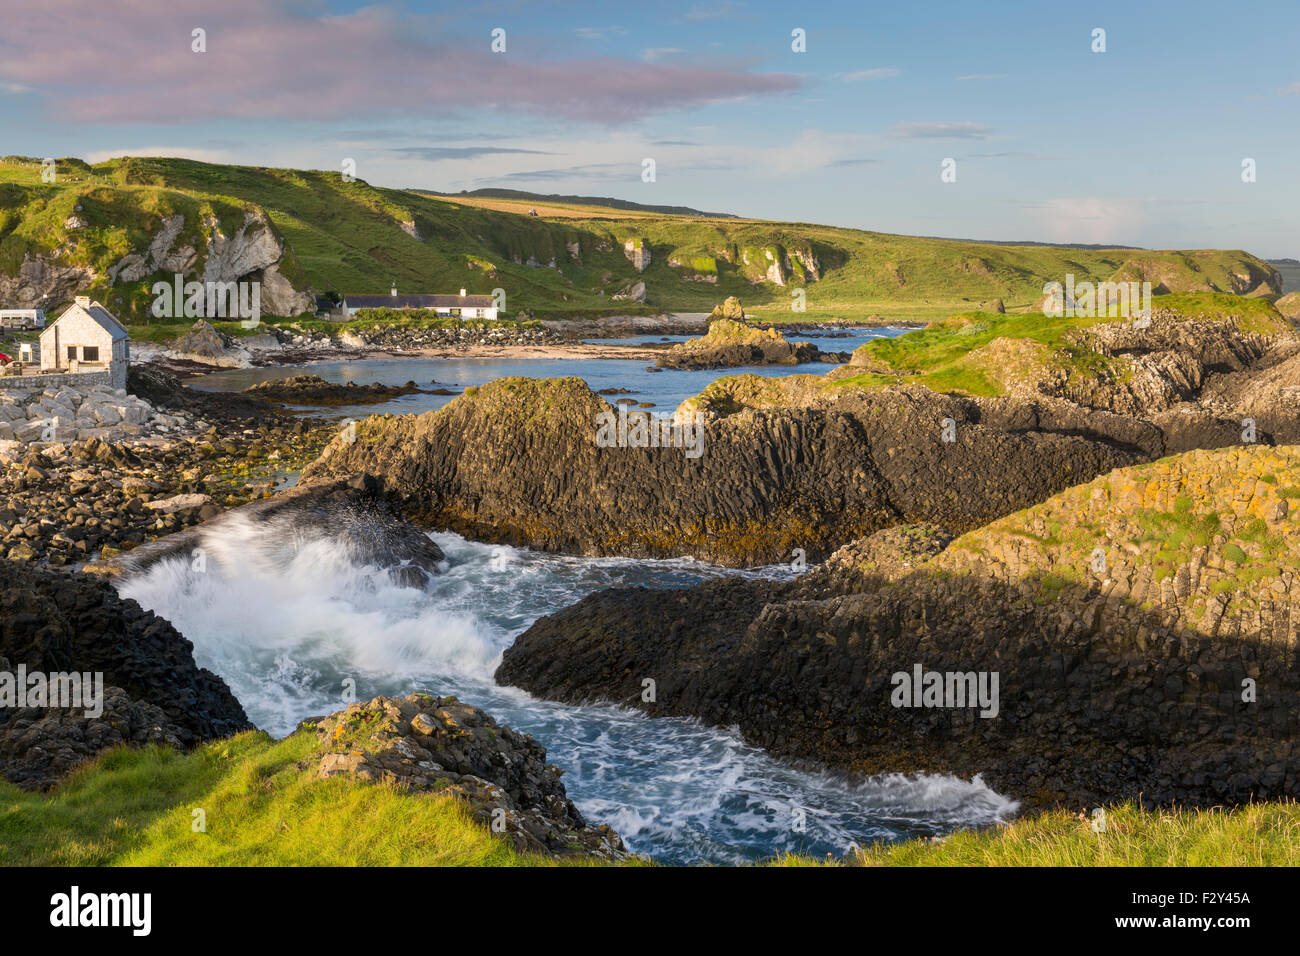 Early morning on the rocks overlooking Ballintoy, County Antrim, Northern Ireland, UK - Stock Image